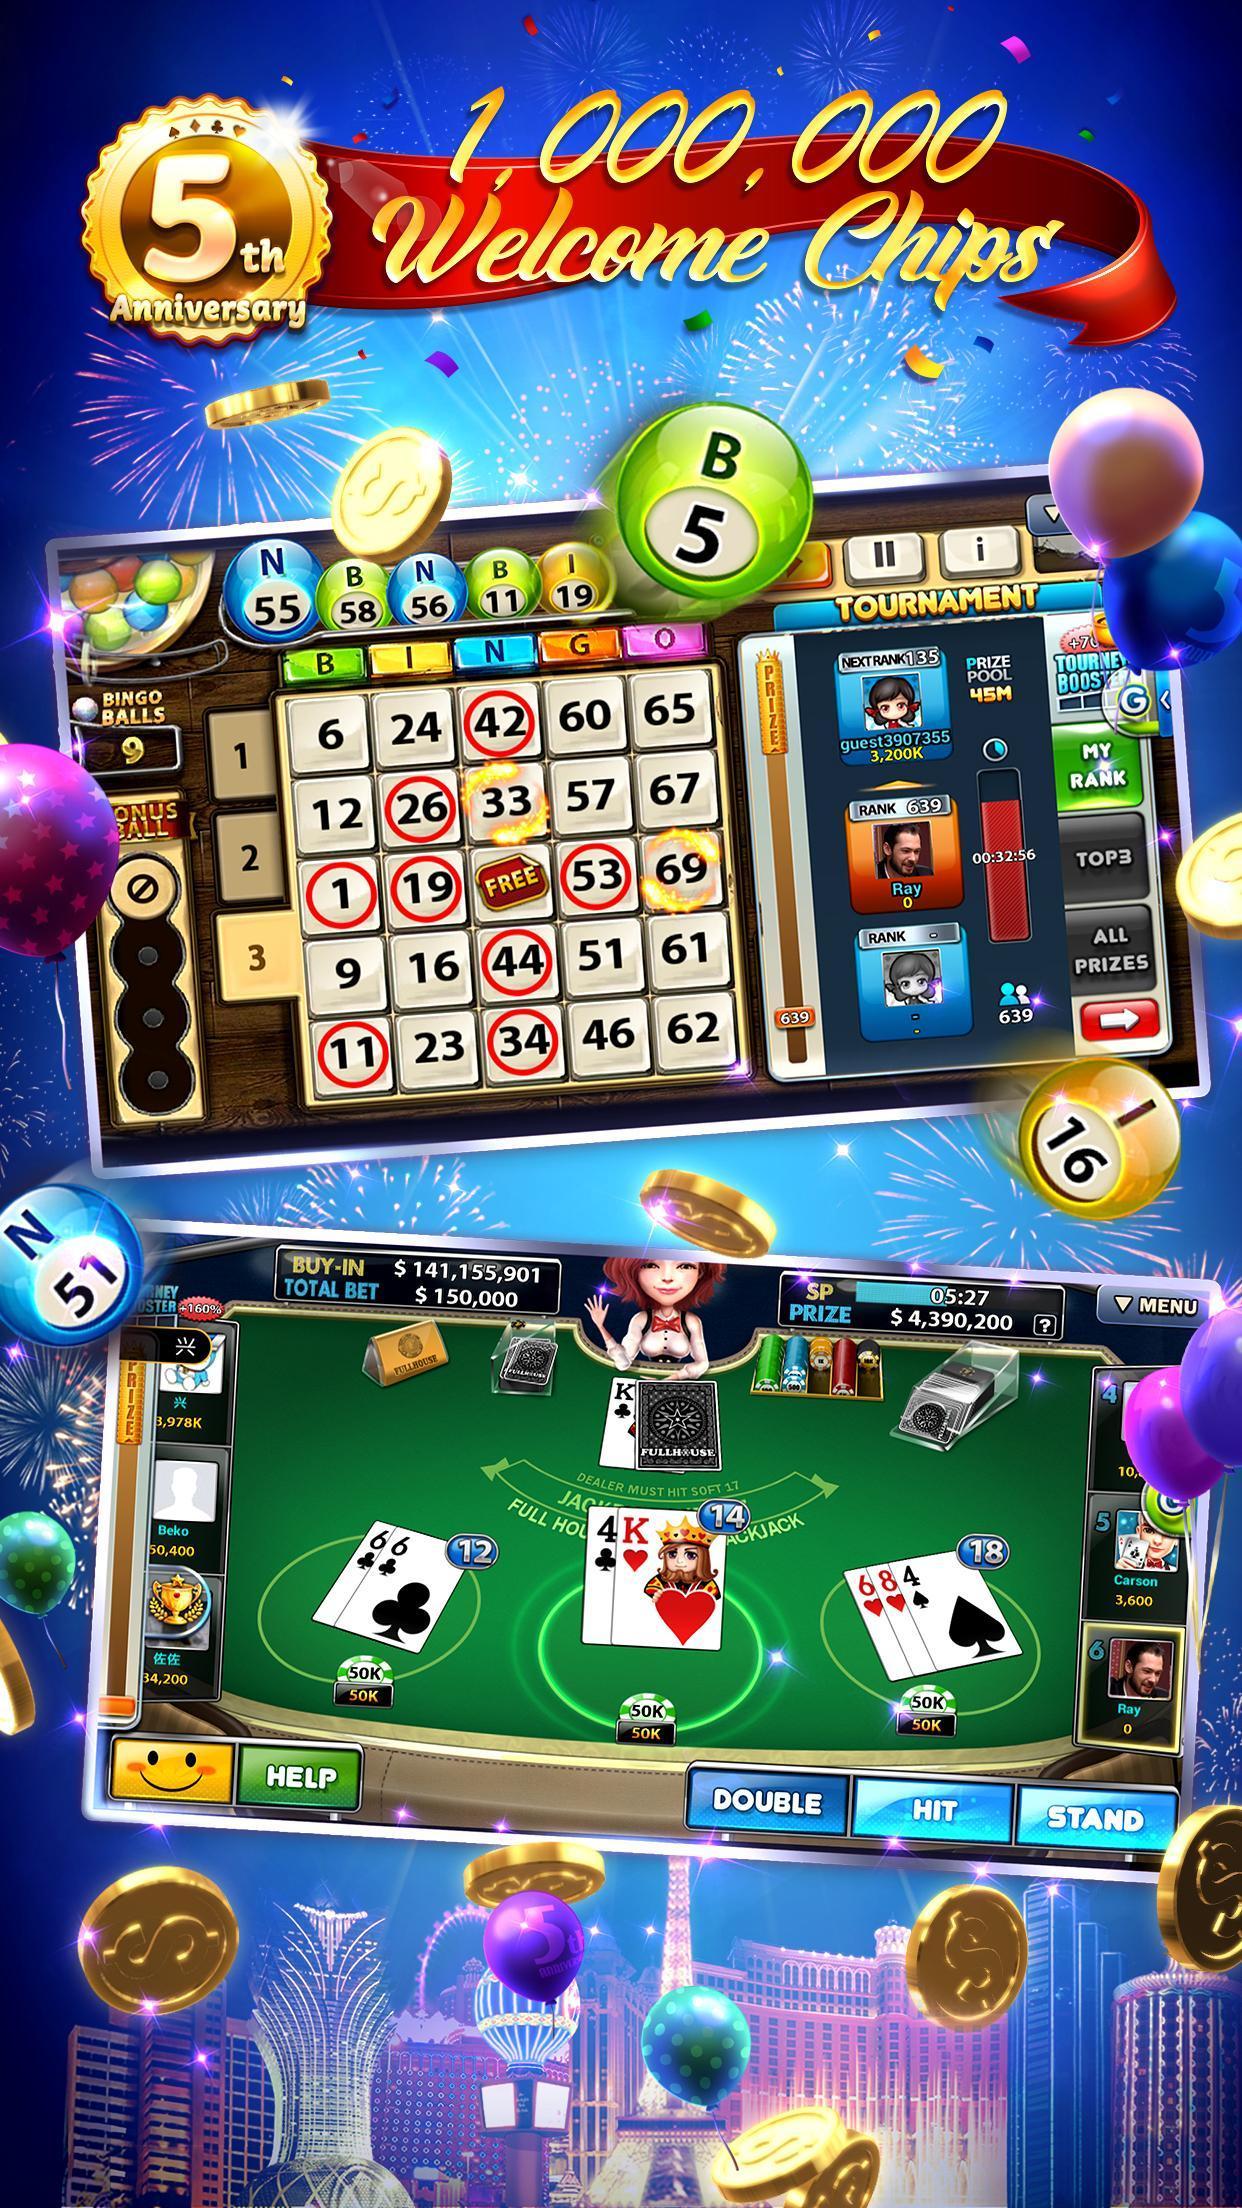 Spielautomaten gratis download